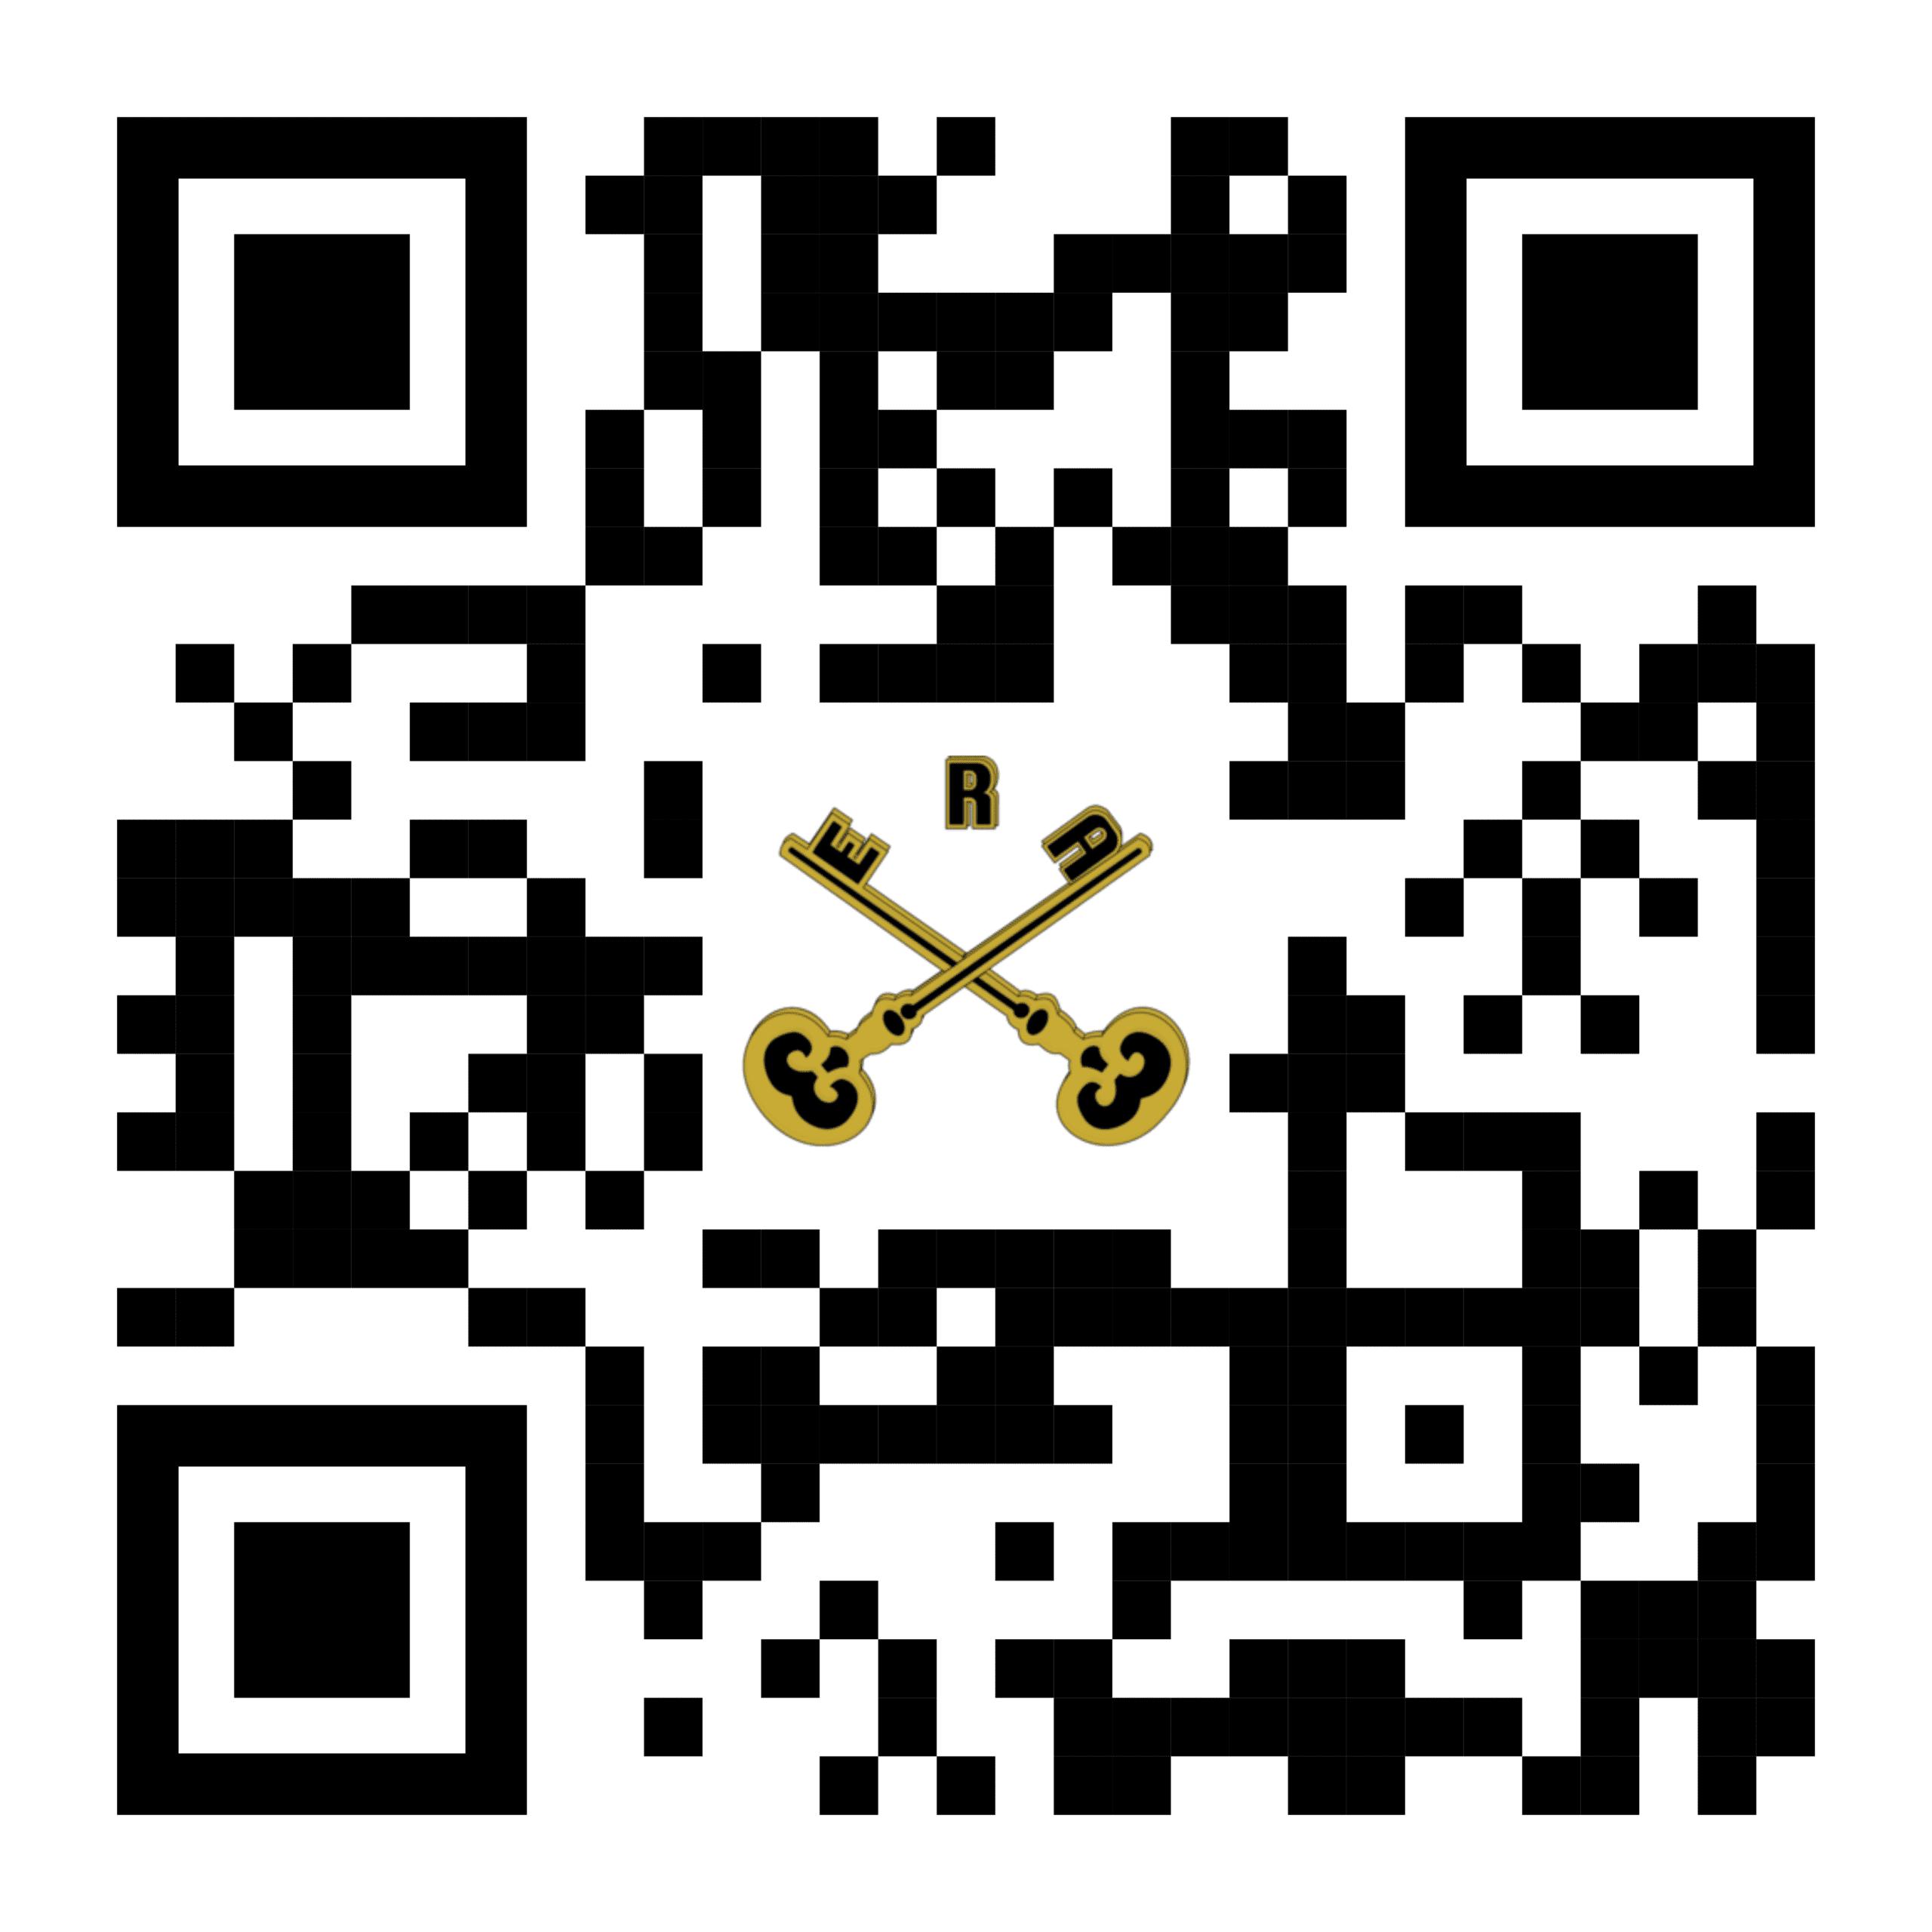 QR Code for era